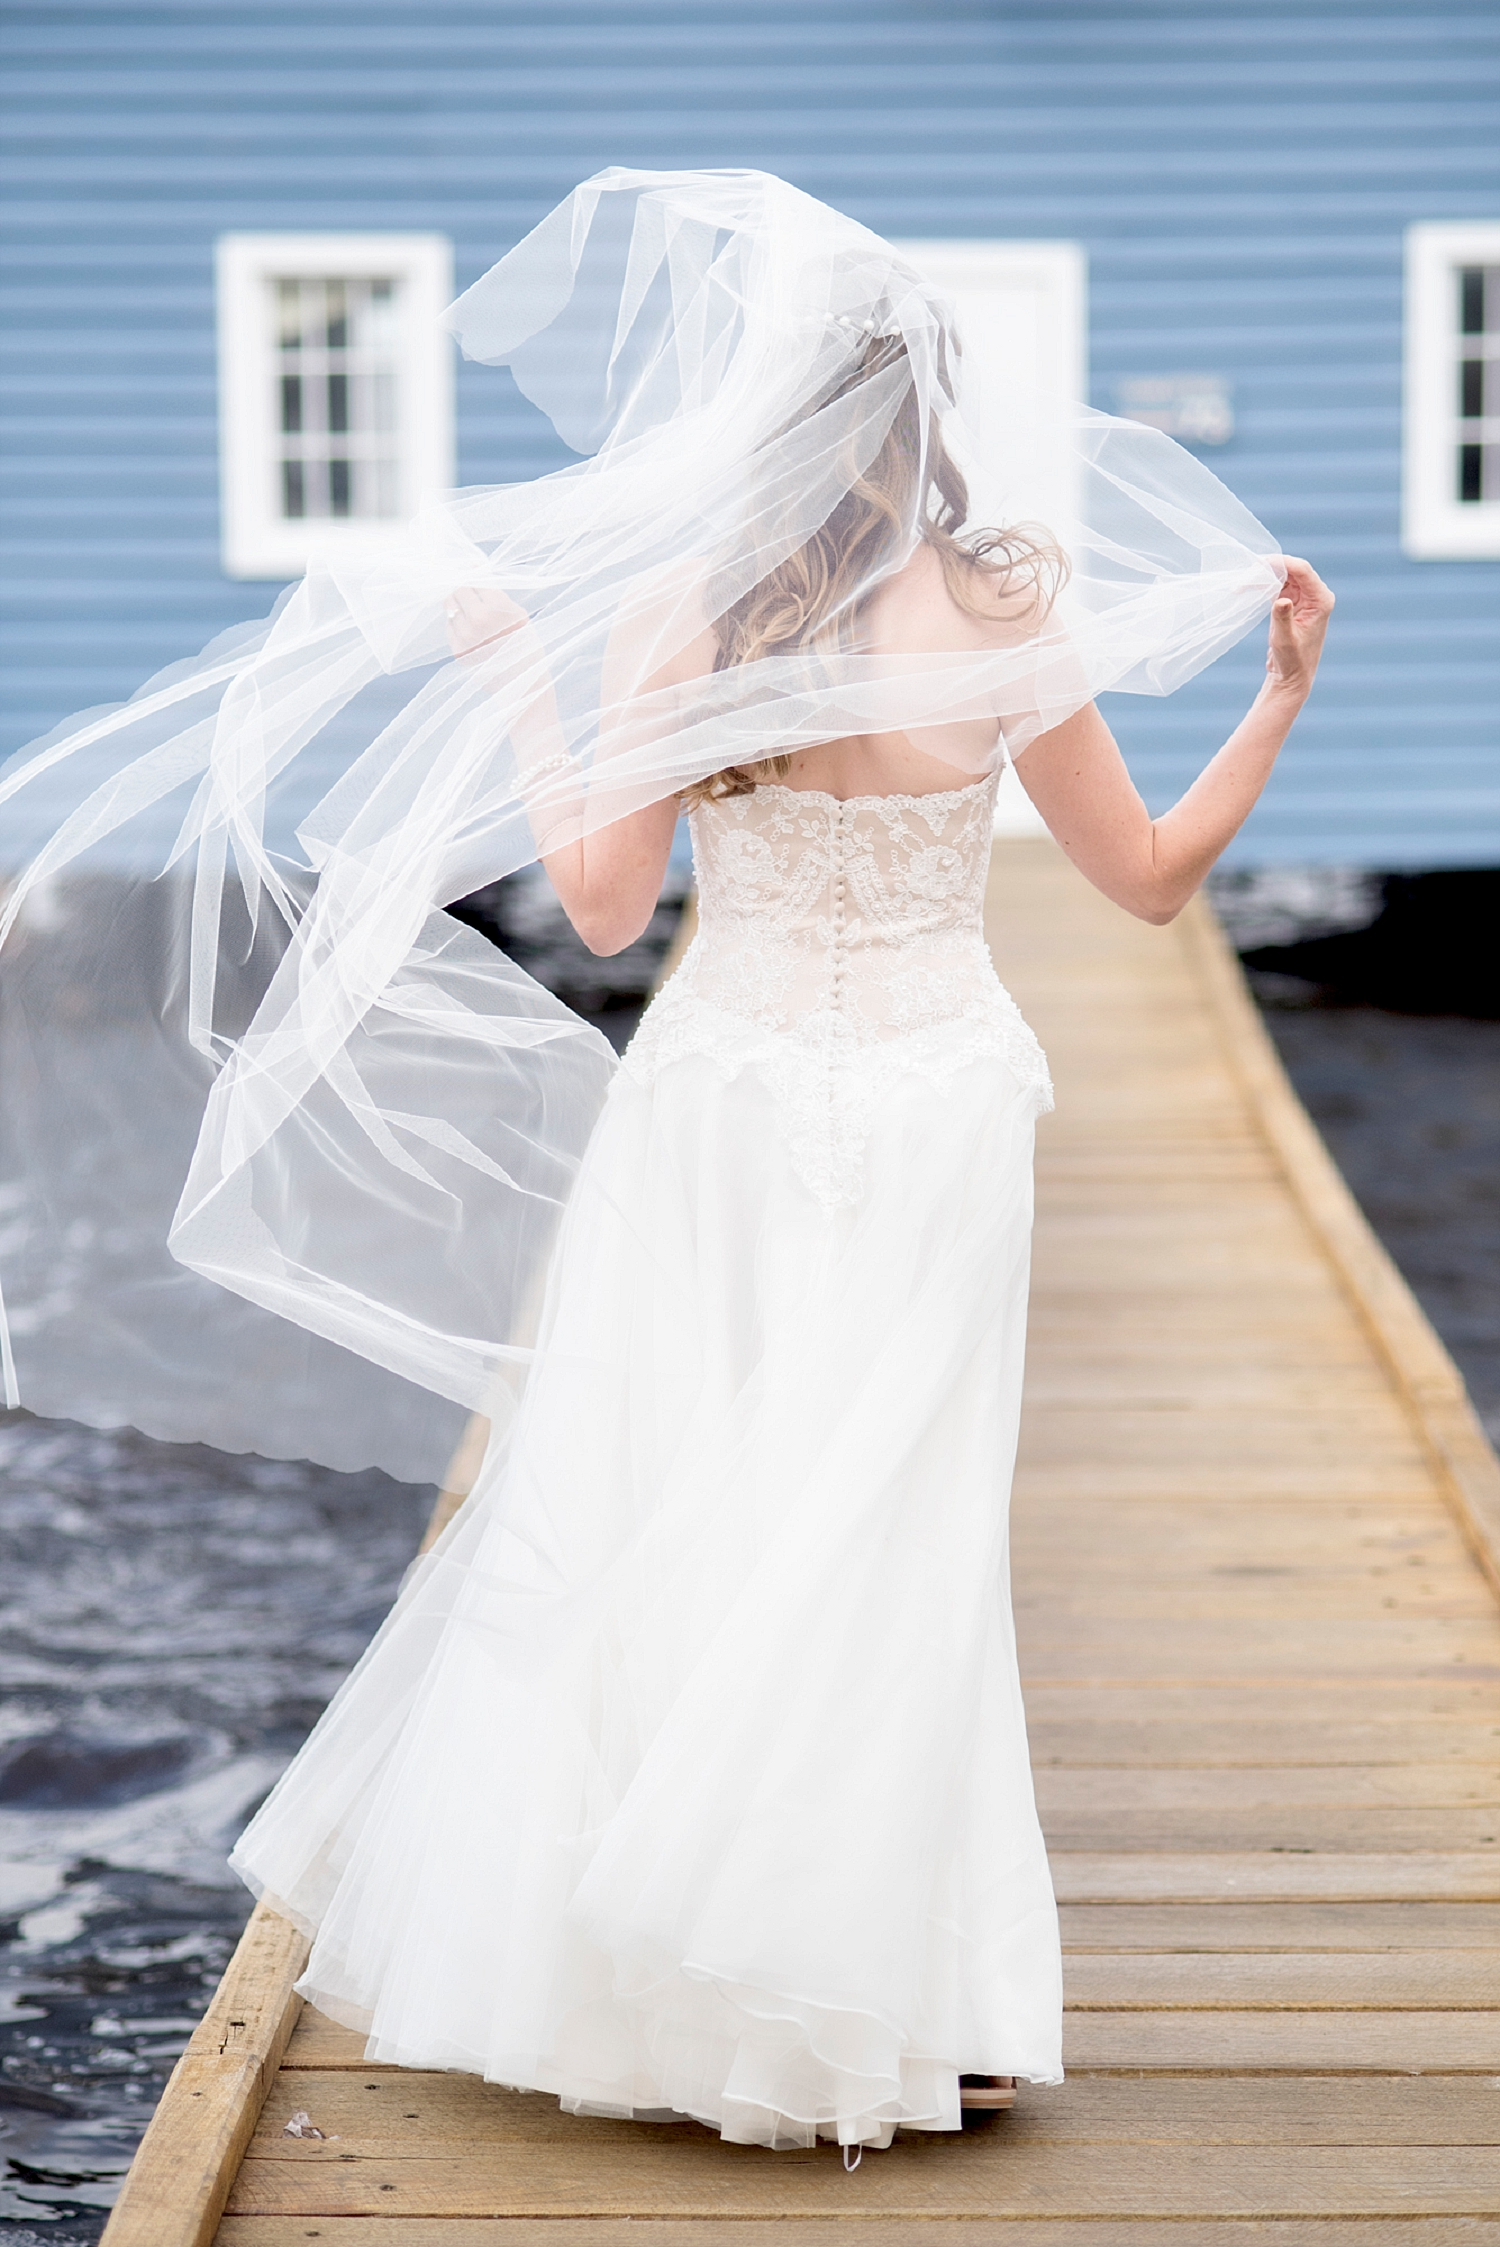 72_perth wedding photographer deray simcoe .jpg